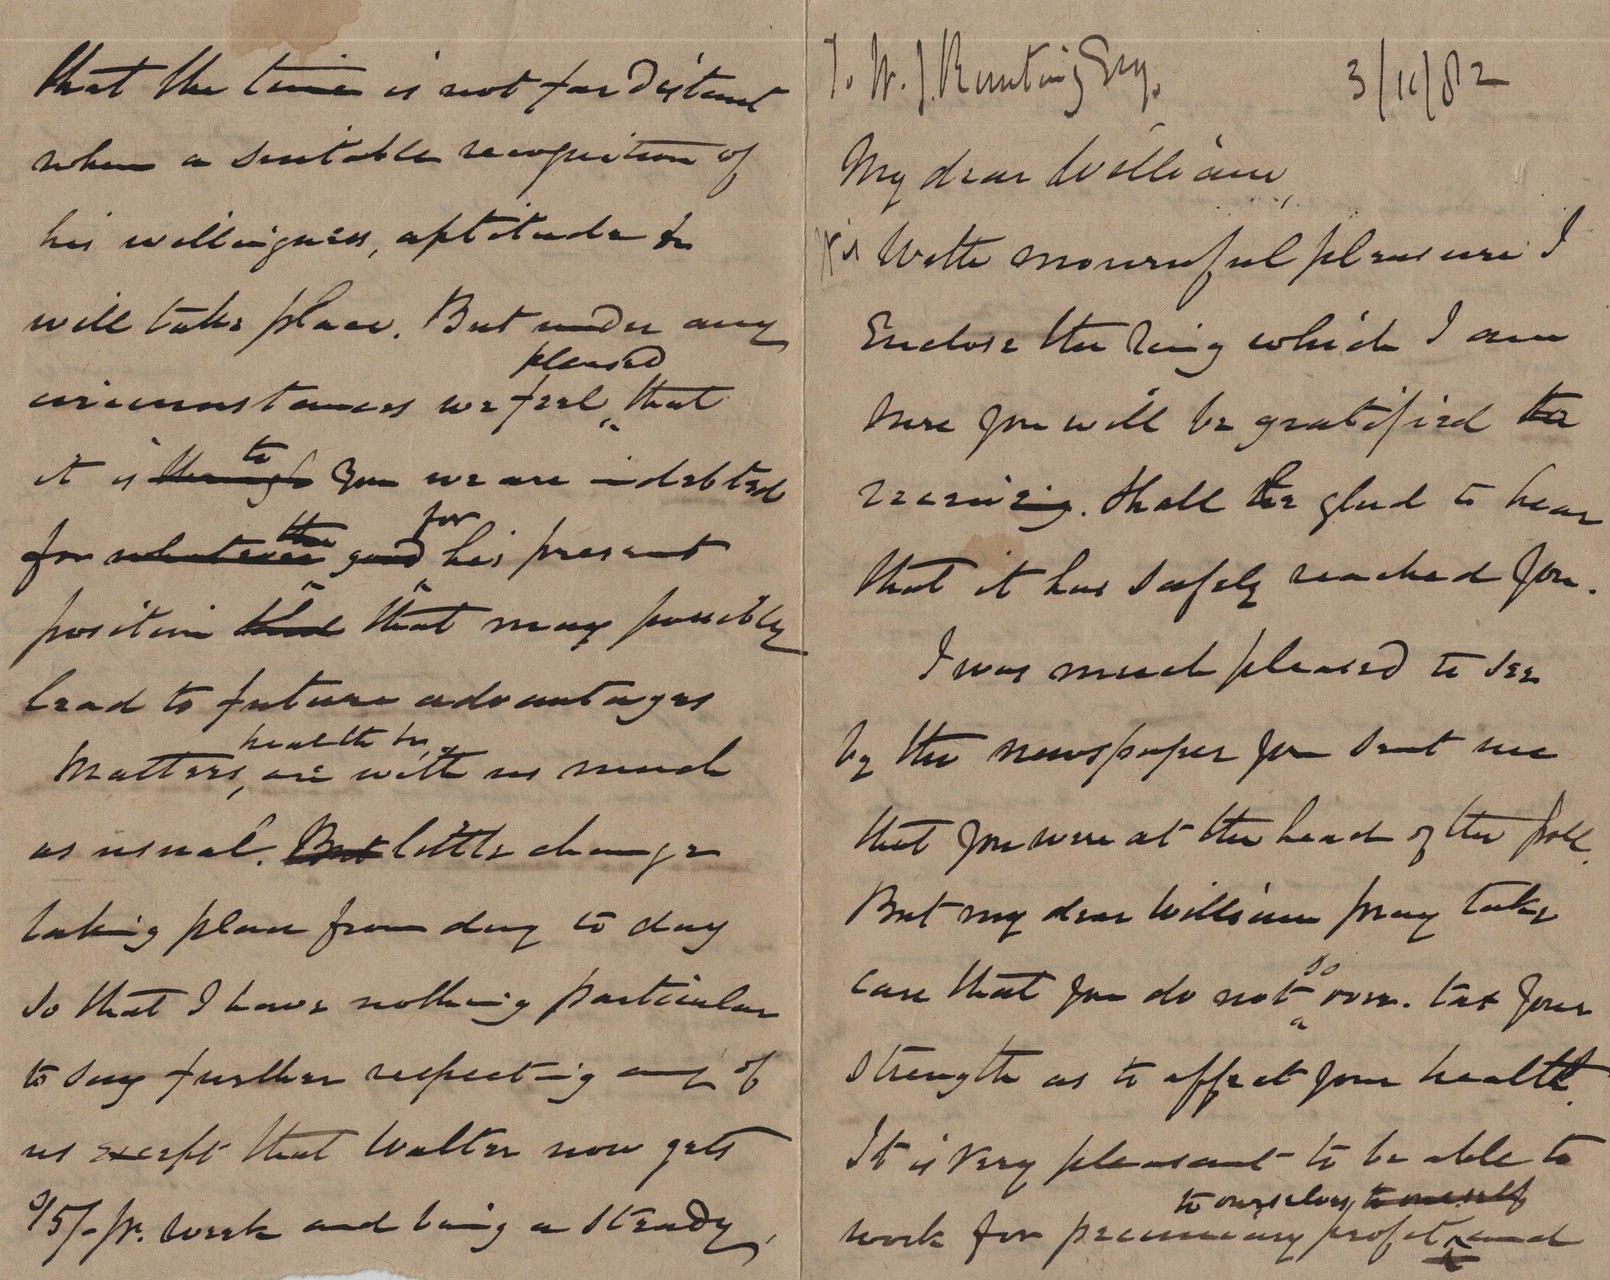 1882 November 3rd JHL to WJR